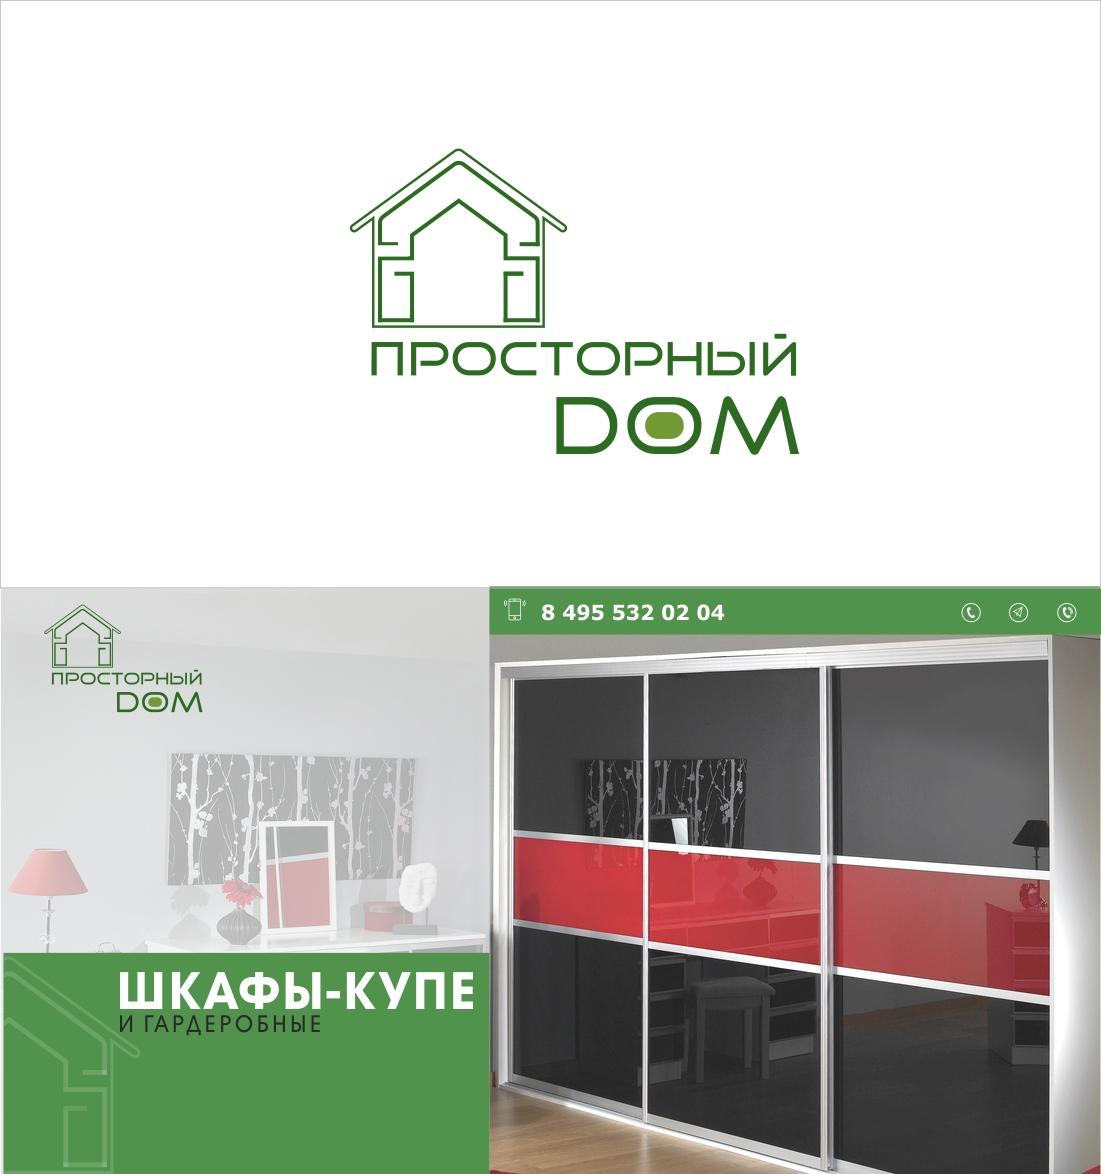 Логотип и фирменный стиль для компании по шкафам-купе фото f_8625b6db03b68fa3.jpg